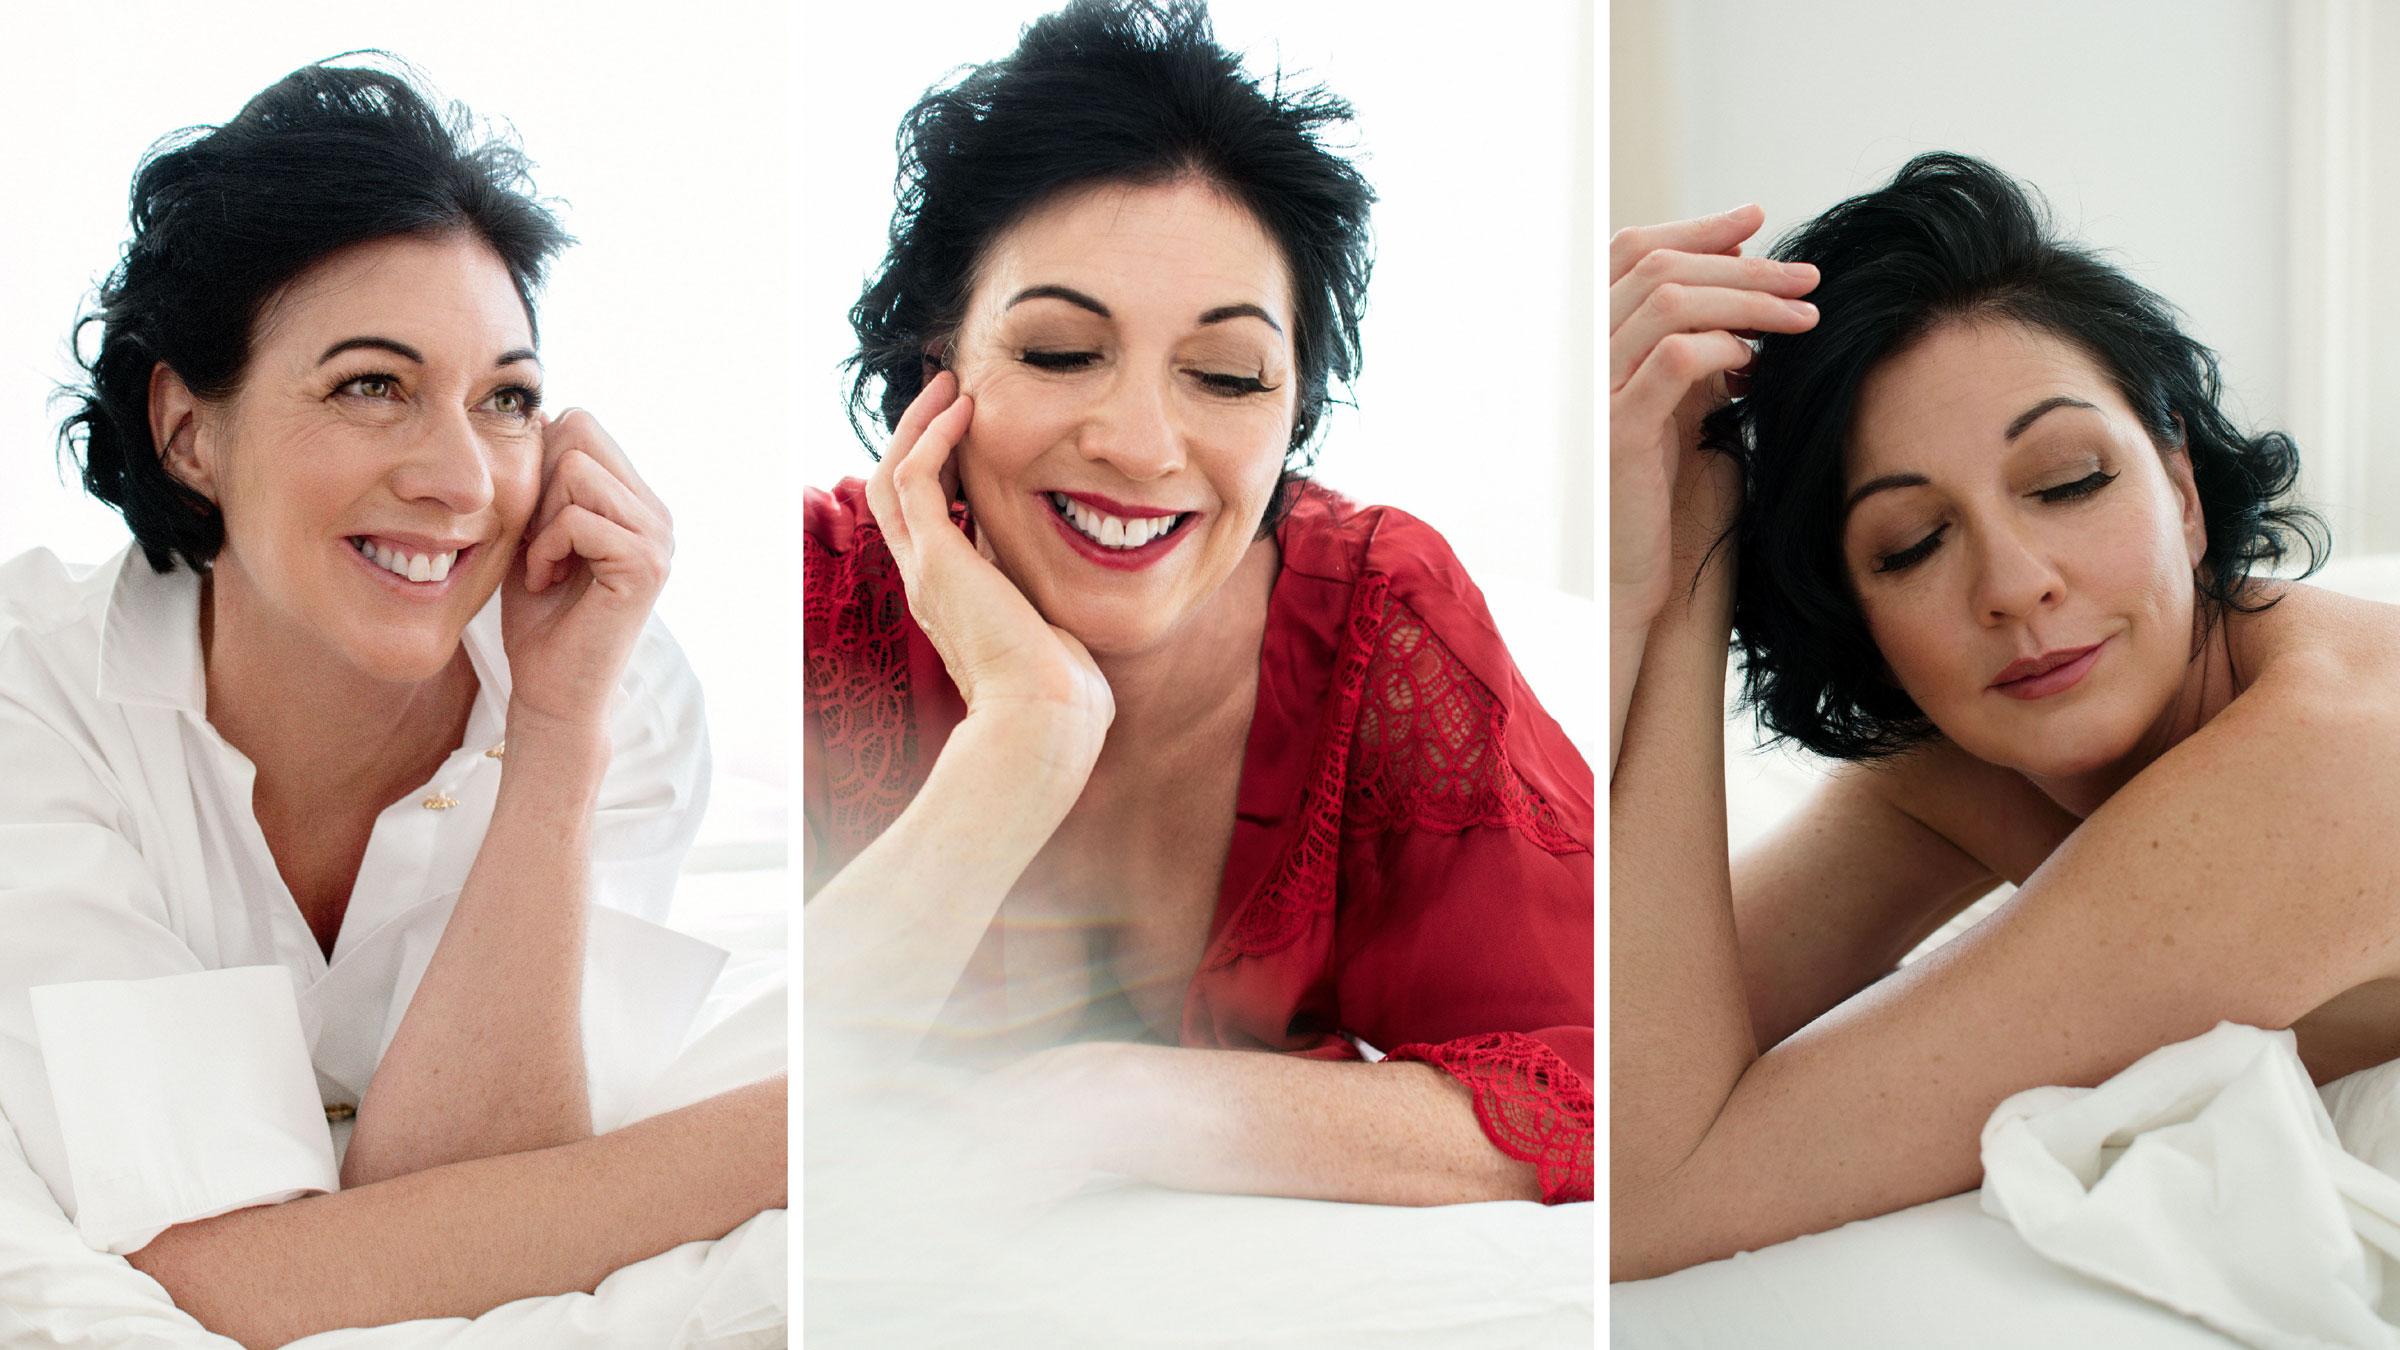 charlotte-kensington-portraits-ulitmate-makeover-2.jpg